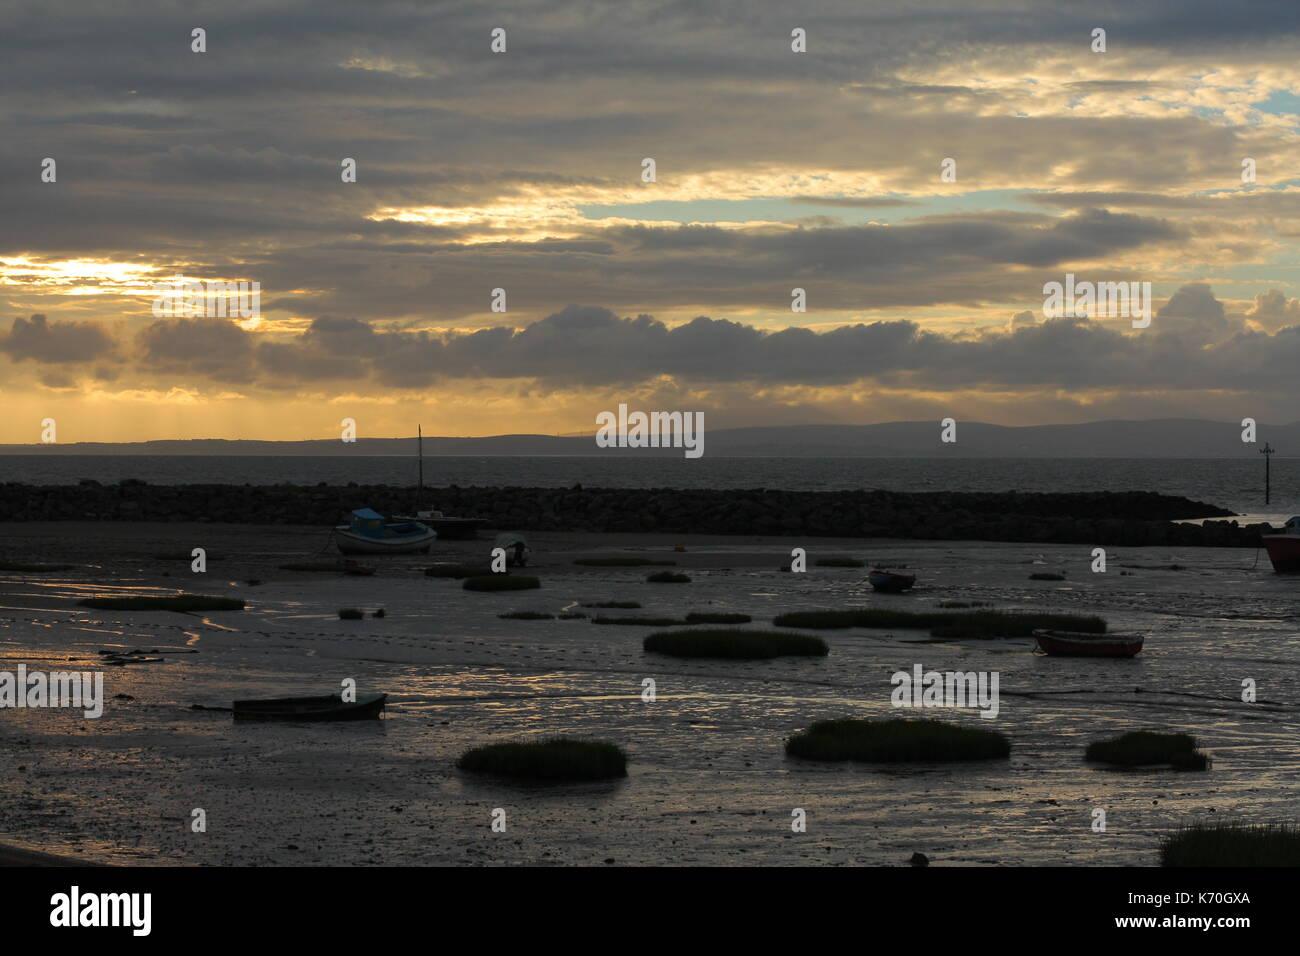 Stranded boats in Morecambe Bay at low tide Stock Photo